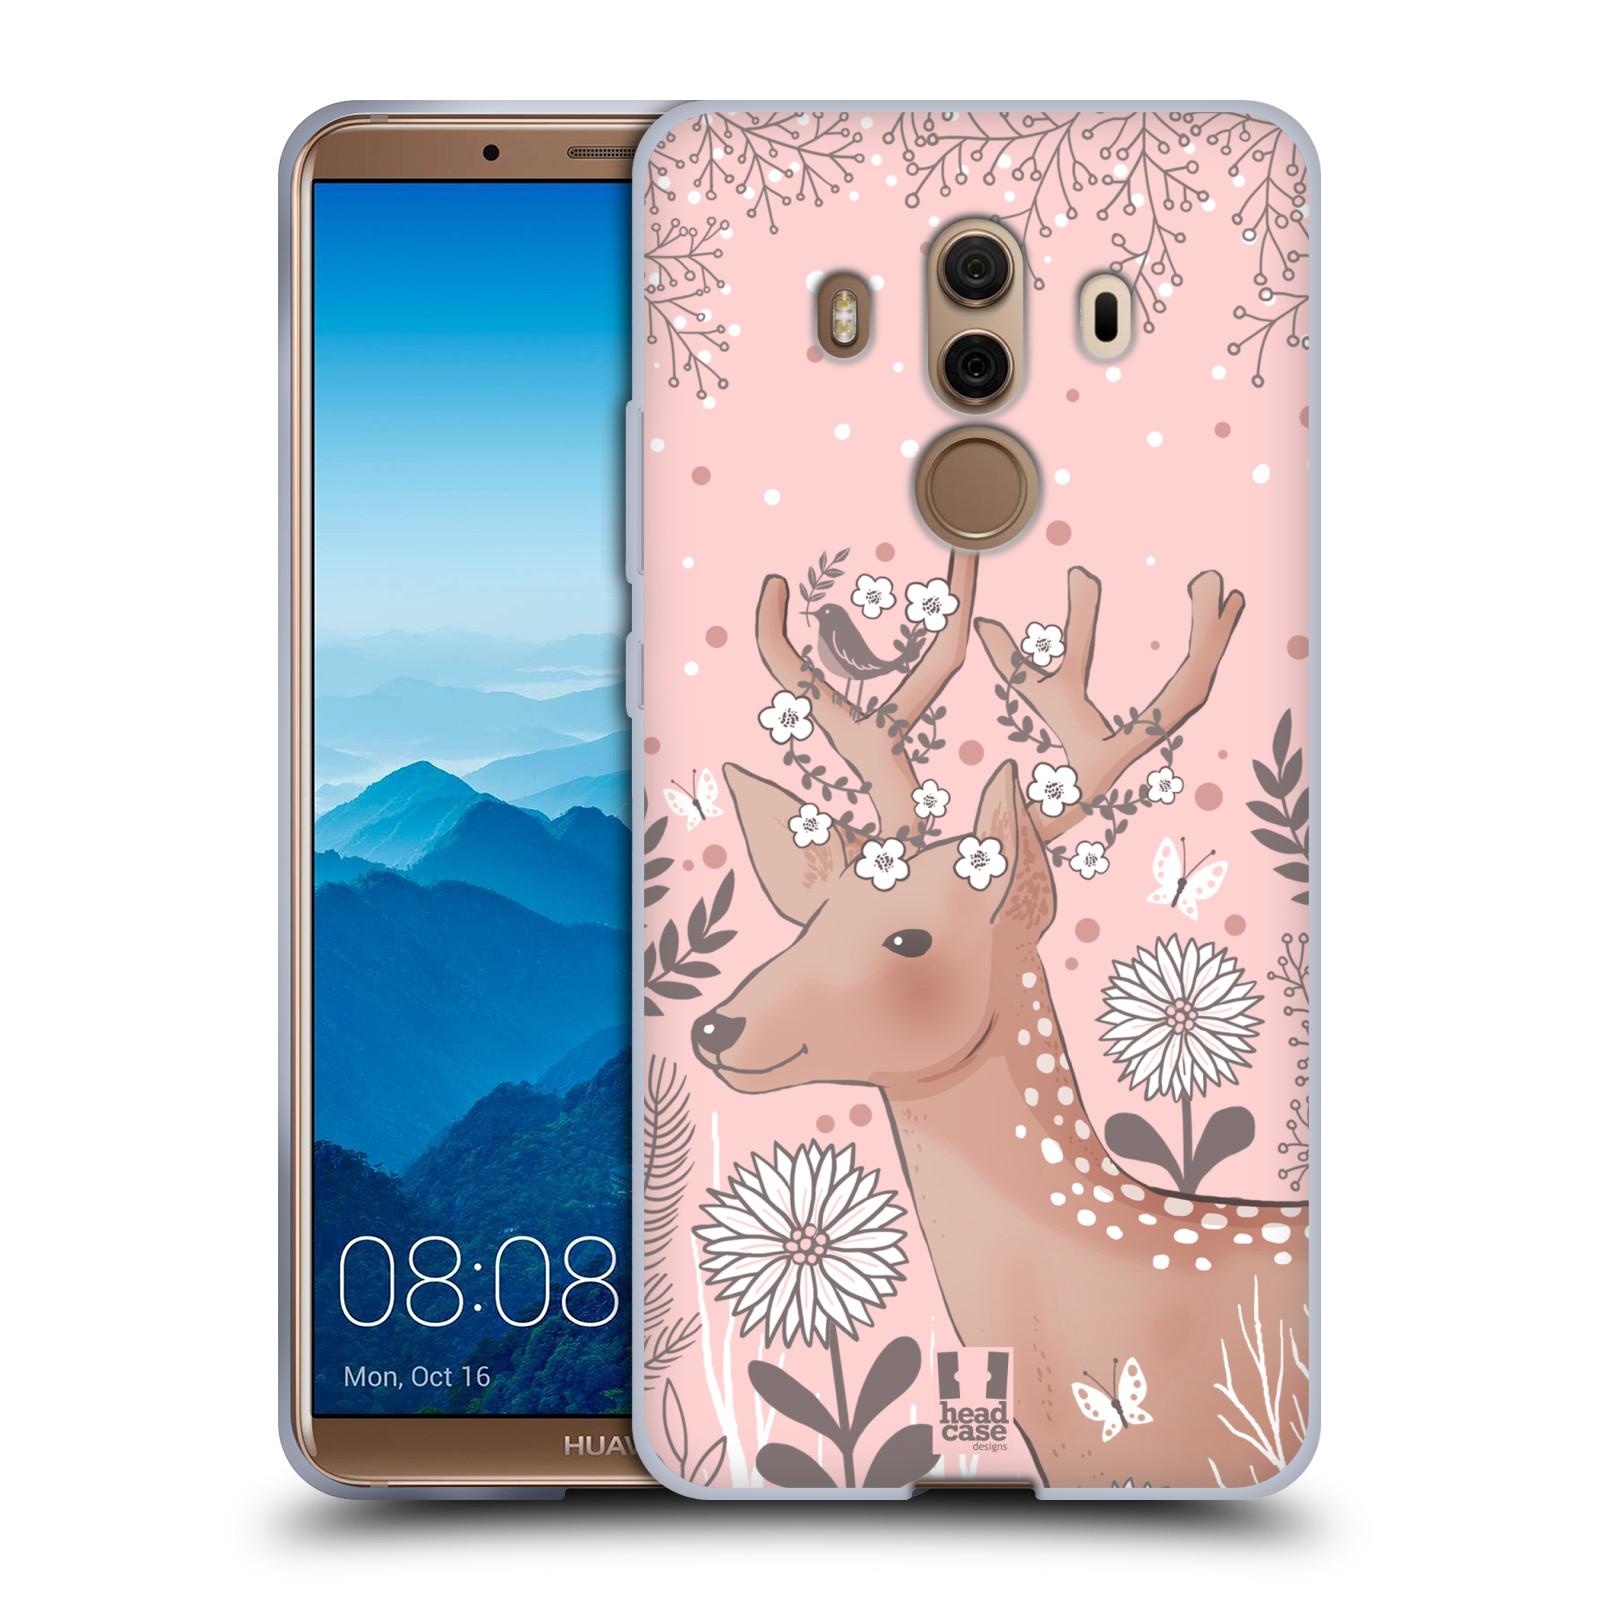 Silikonové pouzdro na mobil Huawei Mate 10 Pro - Head Case - Jelíneček